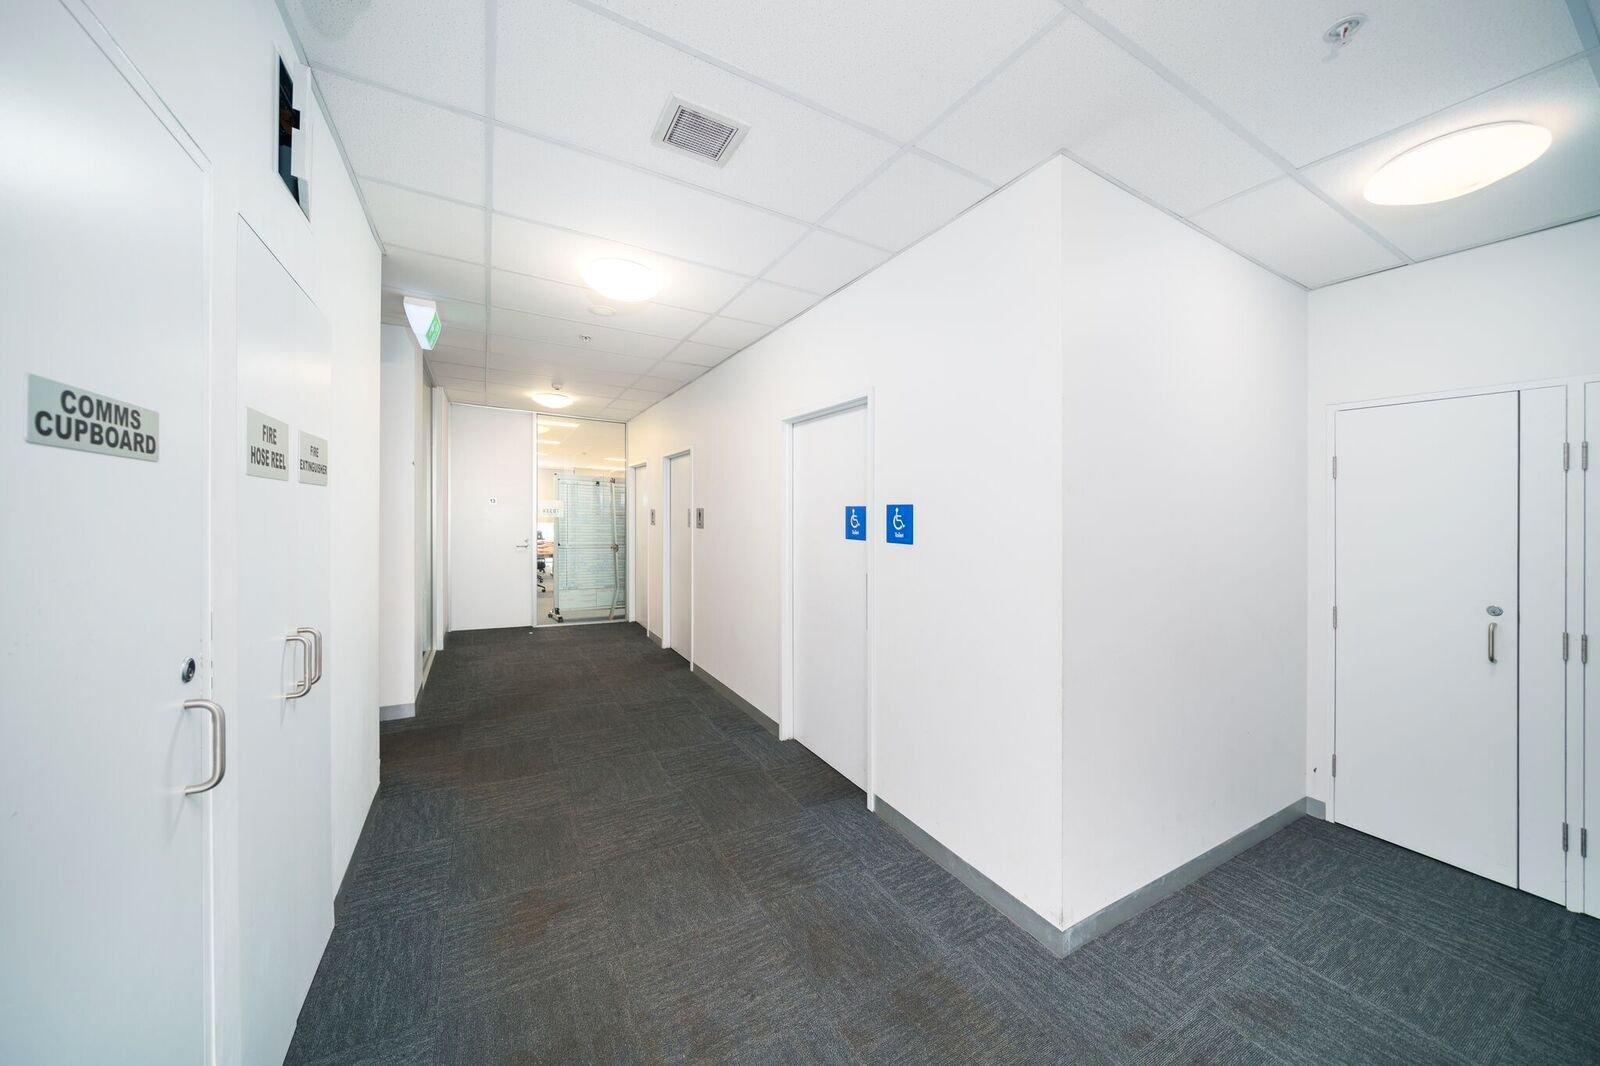 13/204 Dryburgh Street, North Melbourne, VIC, 3051 image 4